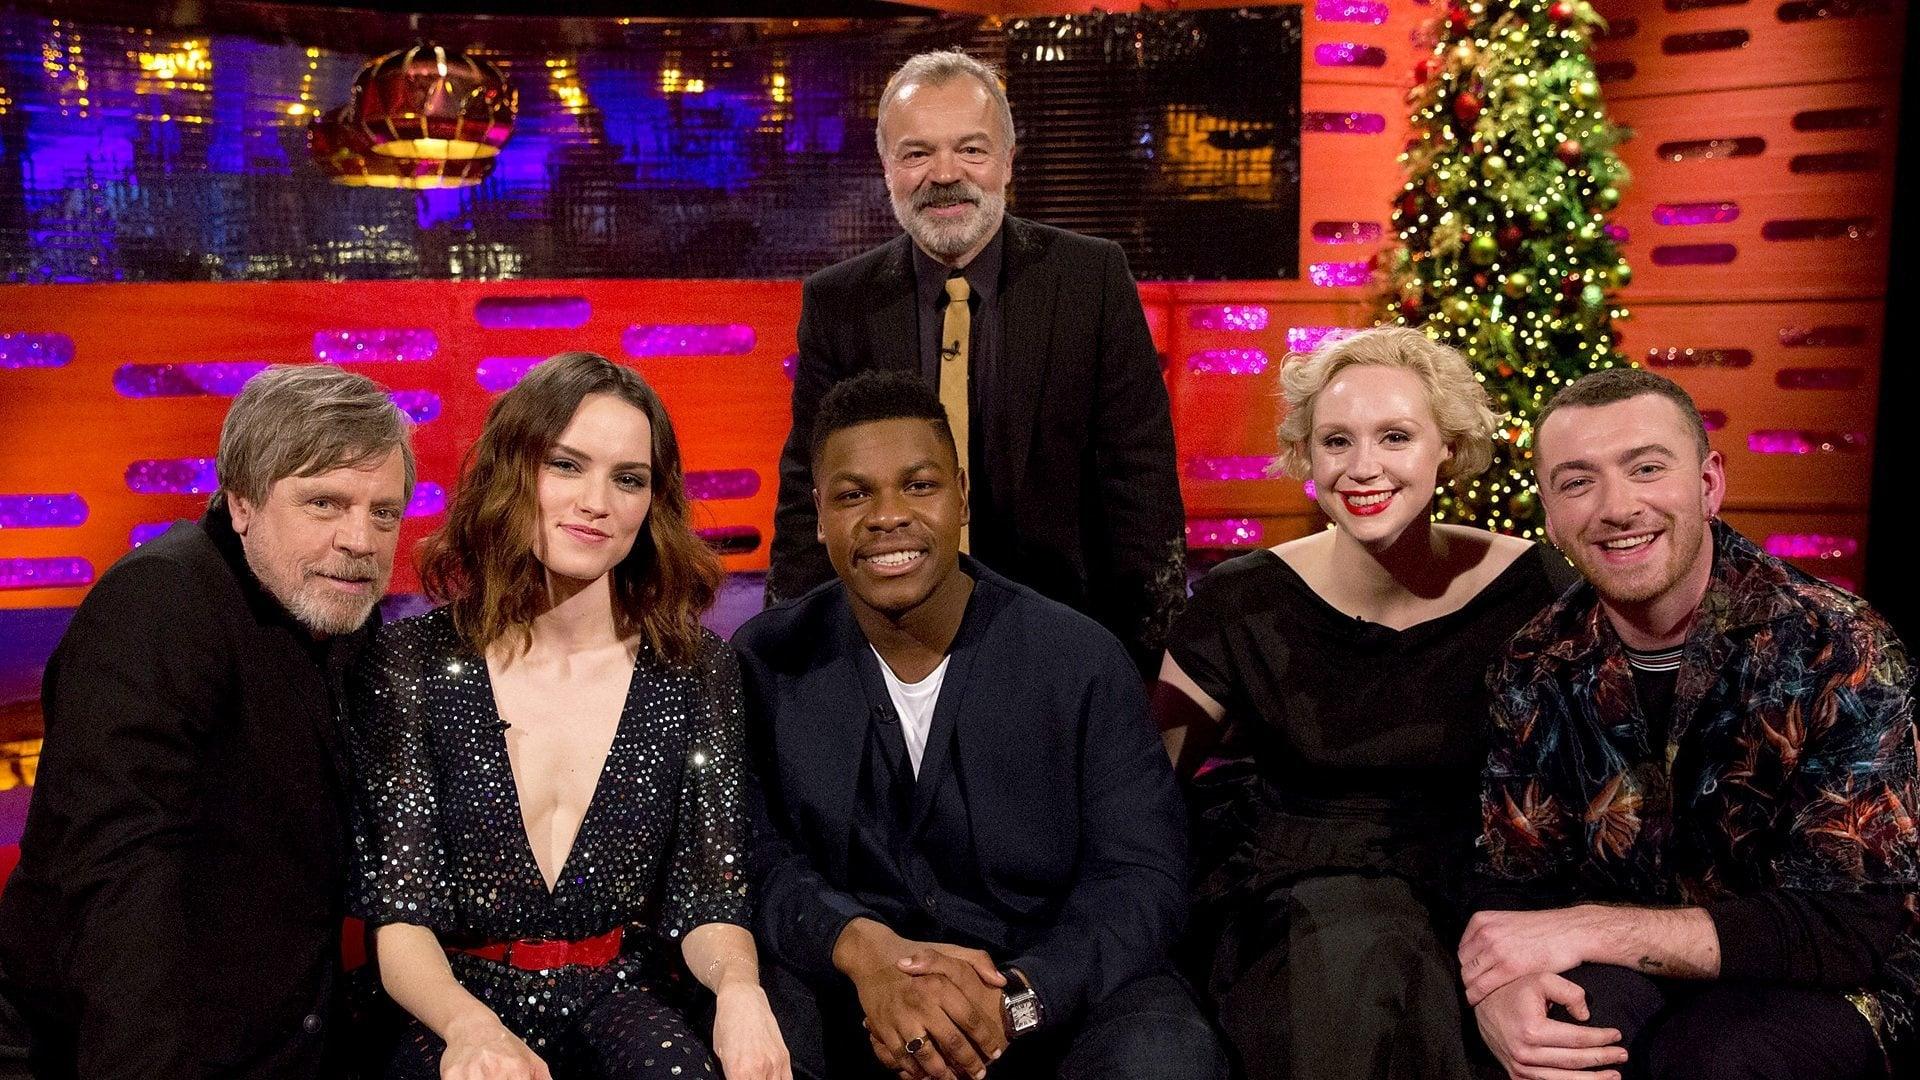 The Graham Norton Show Season 22 :Episode 11  Daisy Ridley, John Boyega, Gwendoline Christie, Mark Hamill, Sam Smith